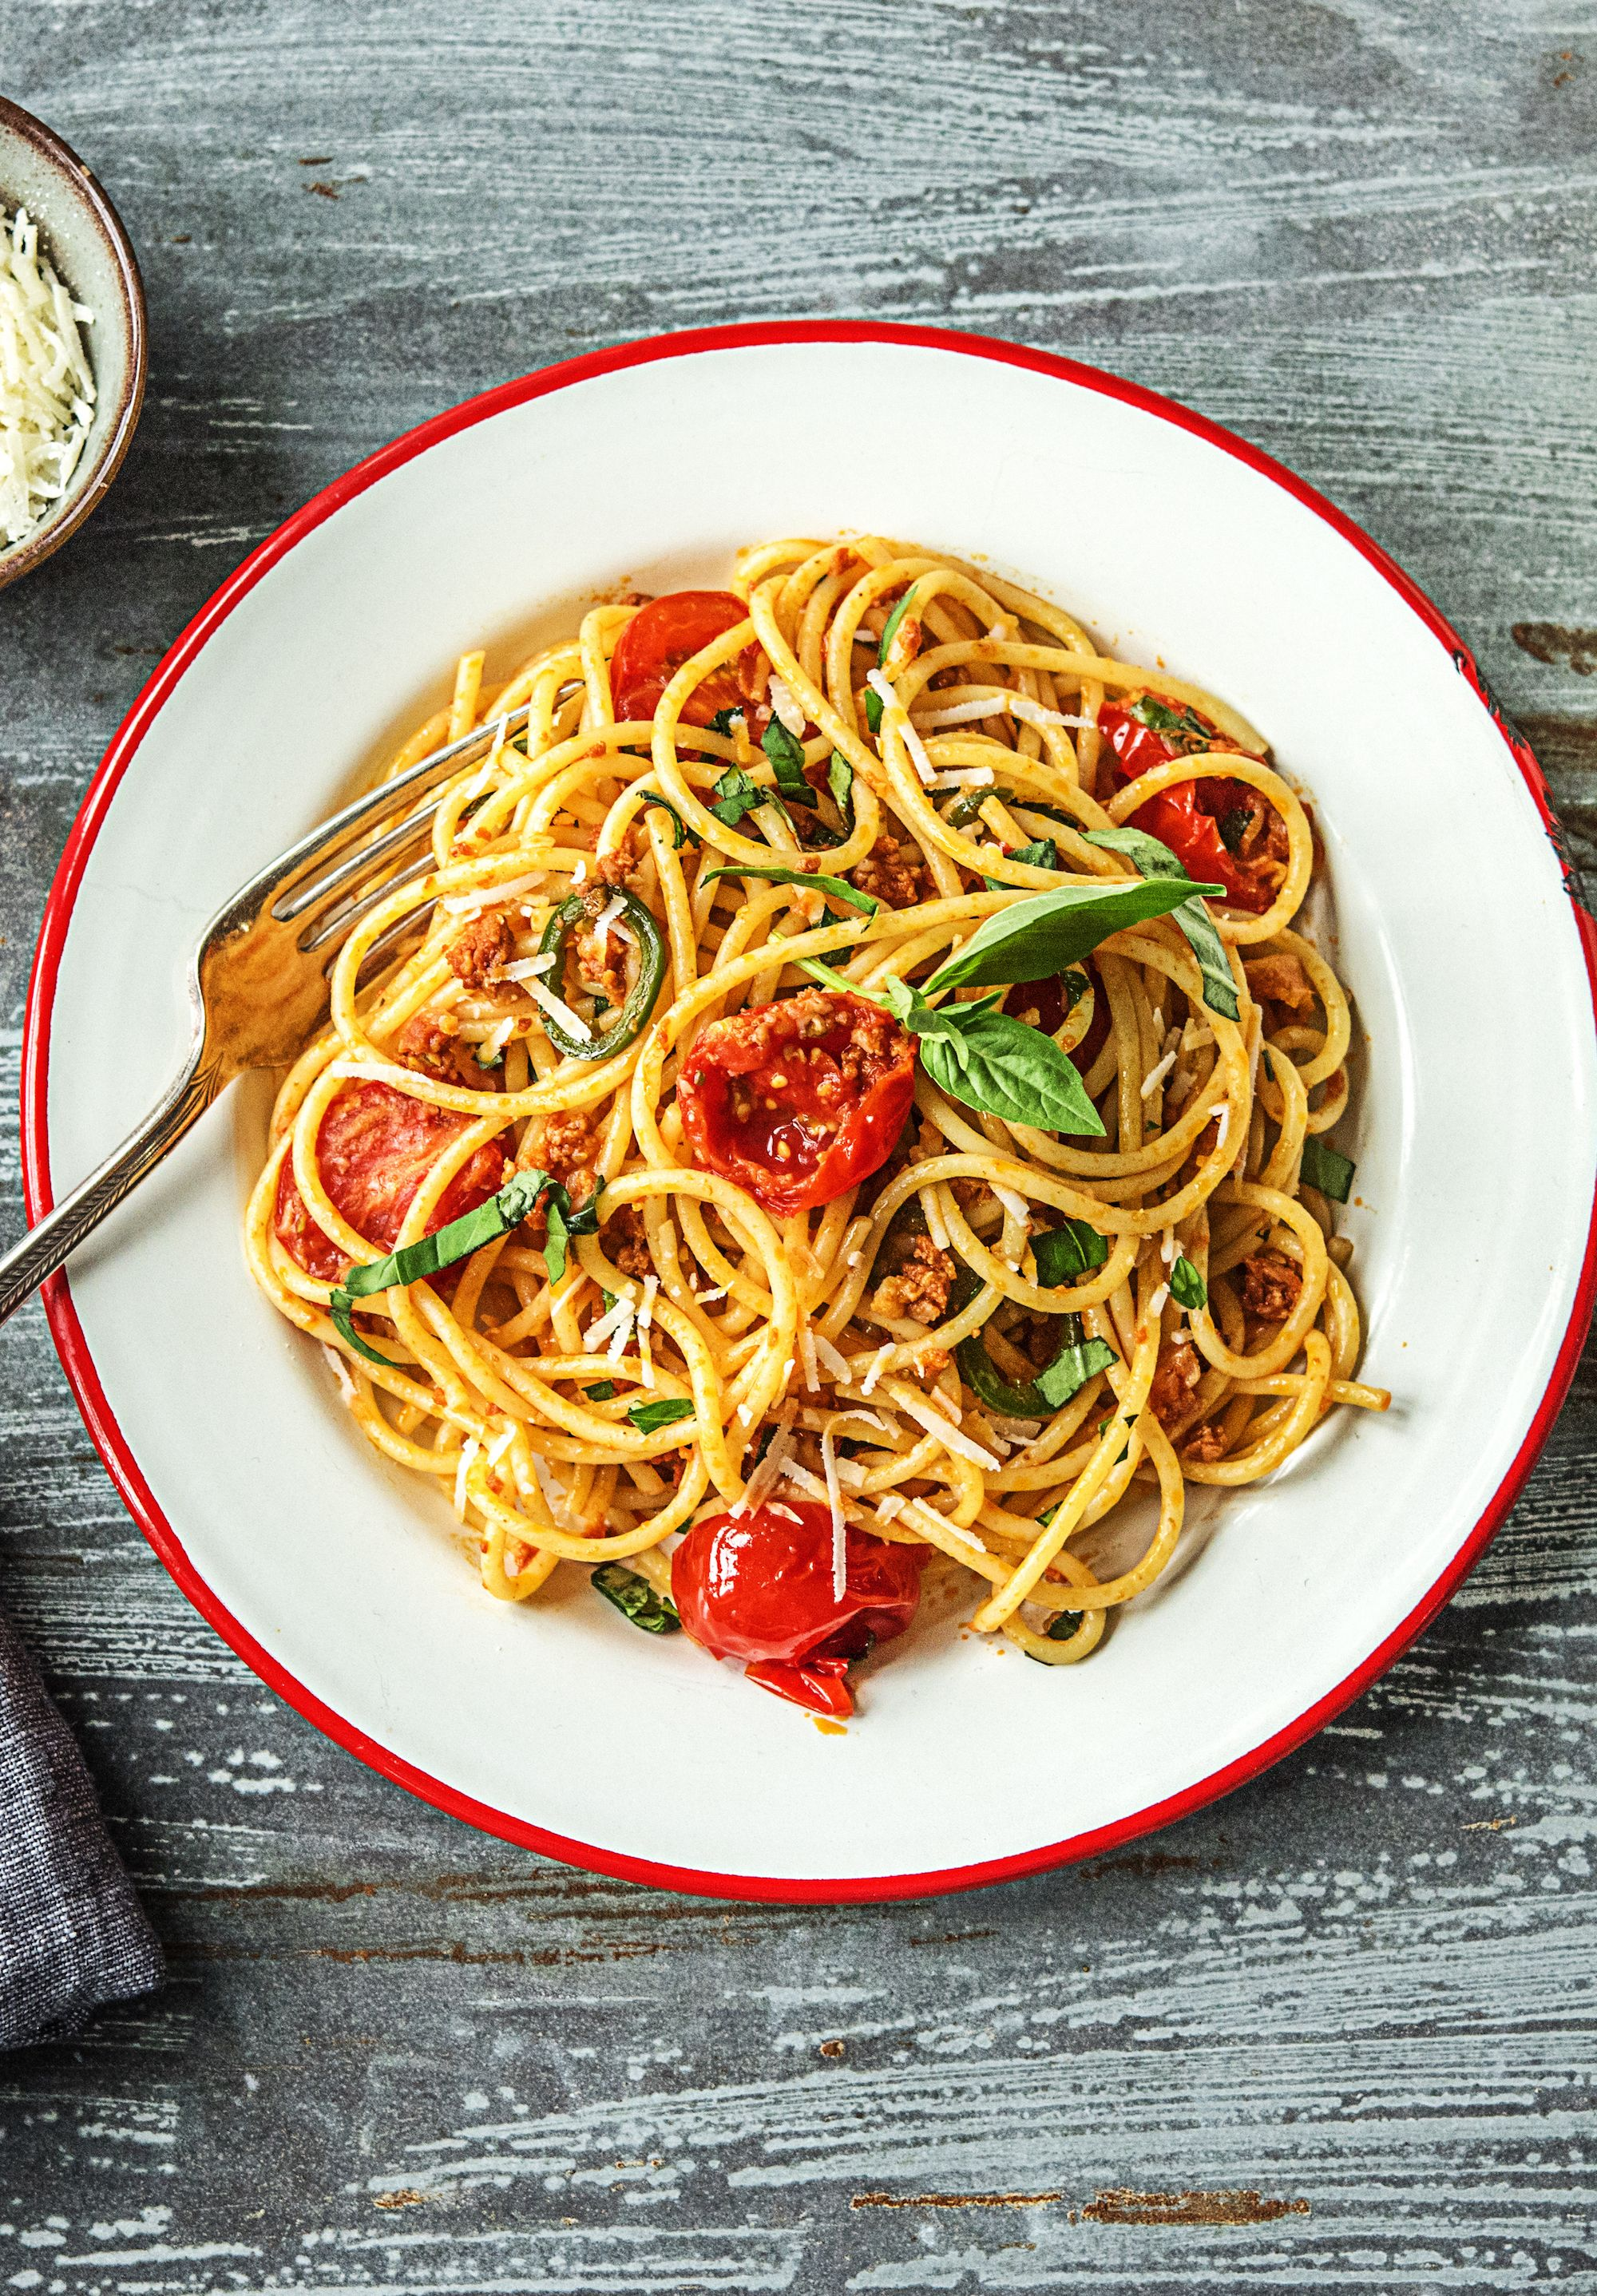 Mario Batali S Spaghetti With Fresh Tomatoes Chorizo And Basil More Easy Pasta Recipes On Hellofresh Com Recipes Fresh Tomato Recipes Spaghetti Recipes